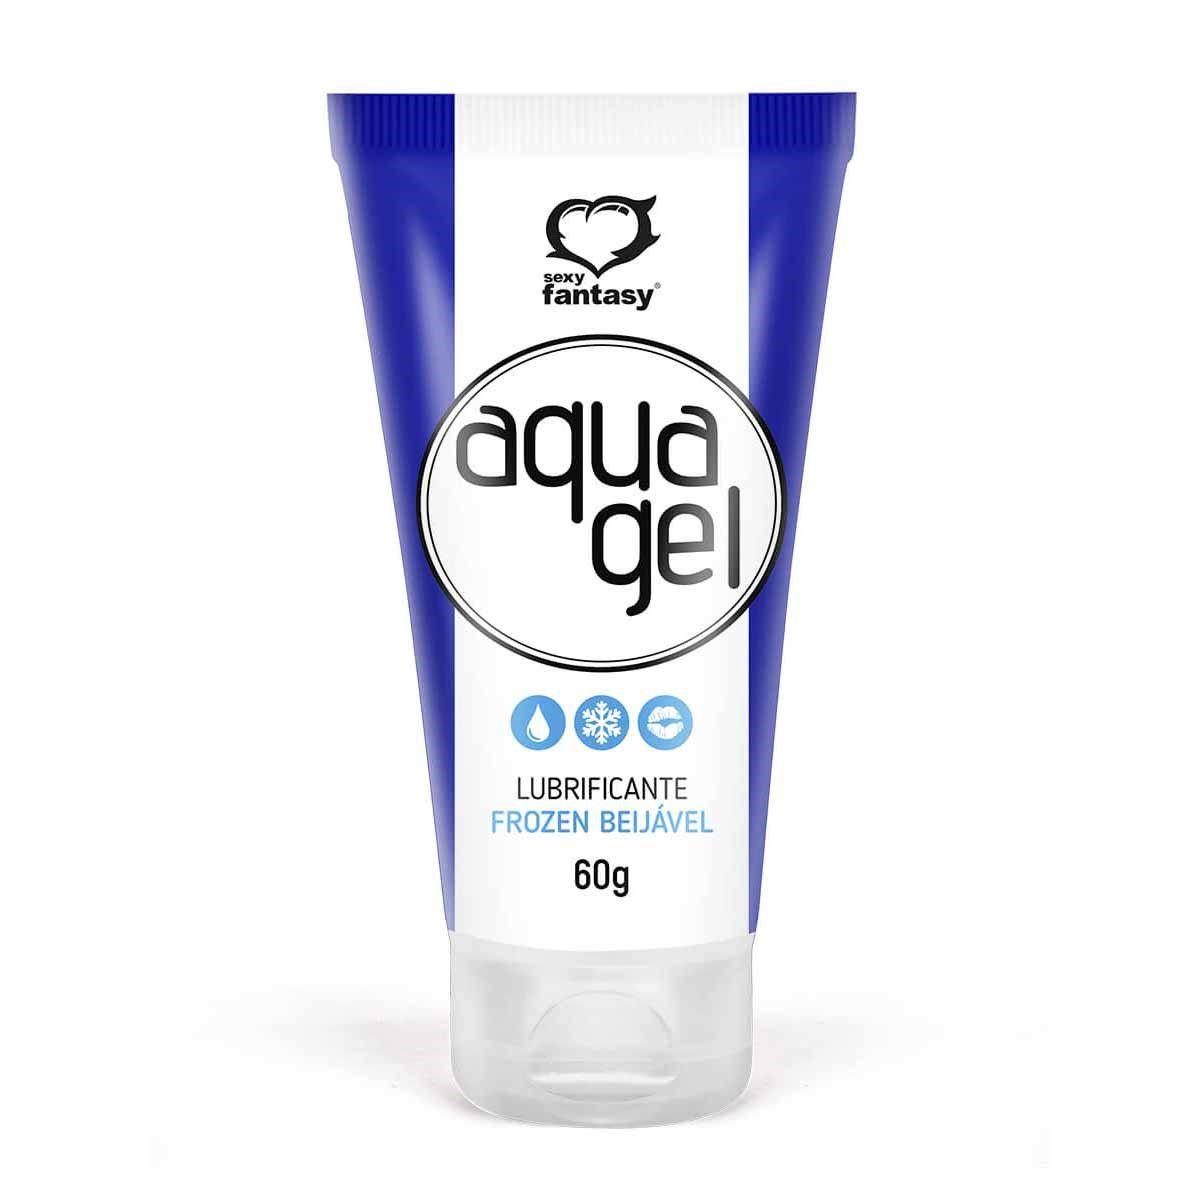 Lubrificante intimo Aqua Gel Frozen 60G - Sexy Fantasy